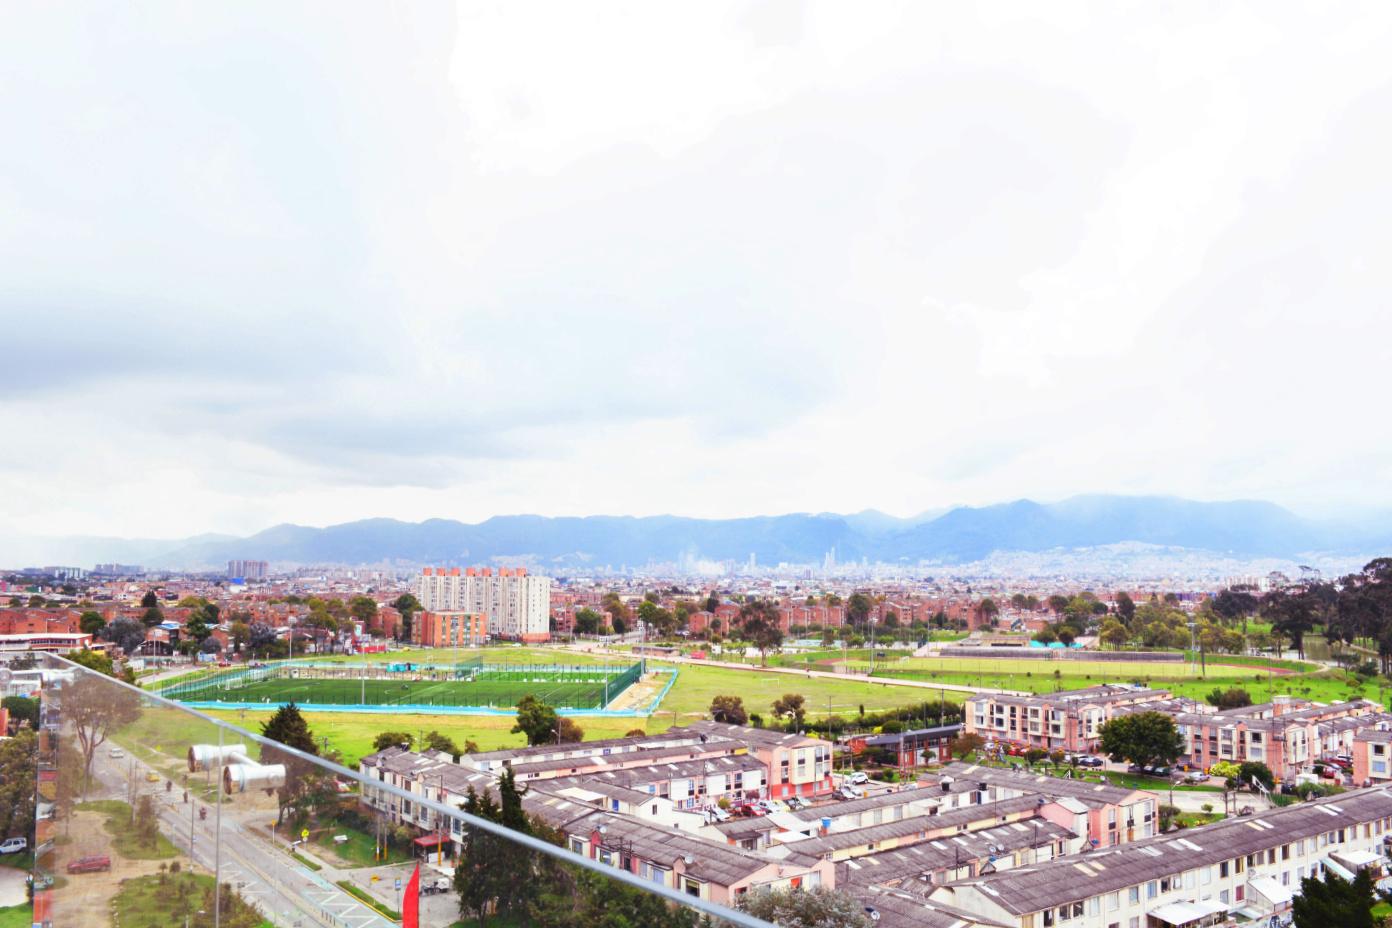 Vista real - Terraza BBQ - Club House - Torres de Timiza, apartamentos en venta, sector Kennedy, Bogotá, vivienda de interés social VIS, aplica subsidio